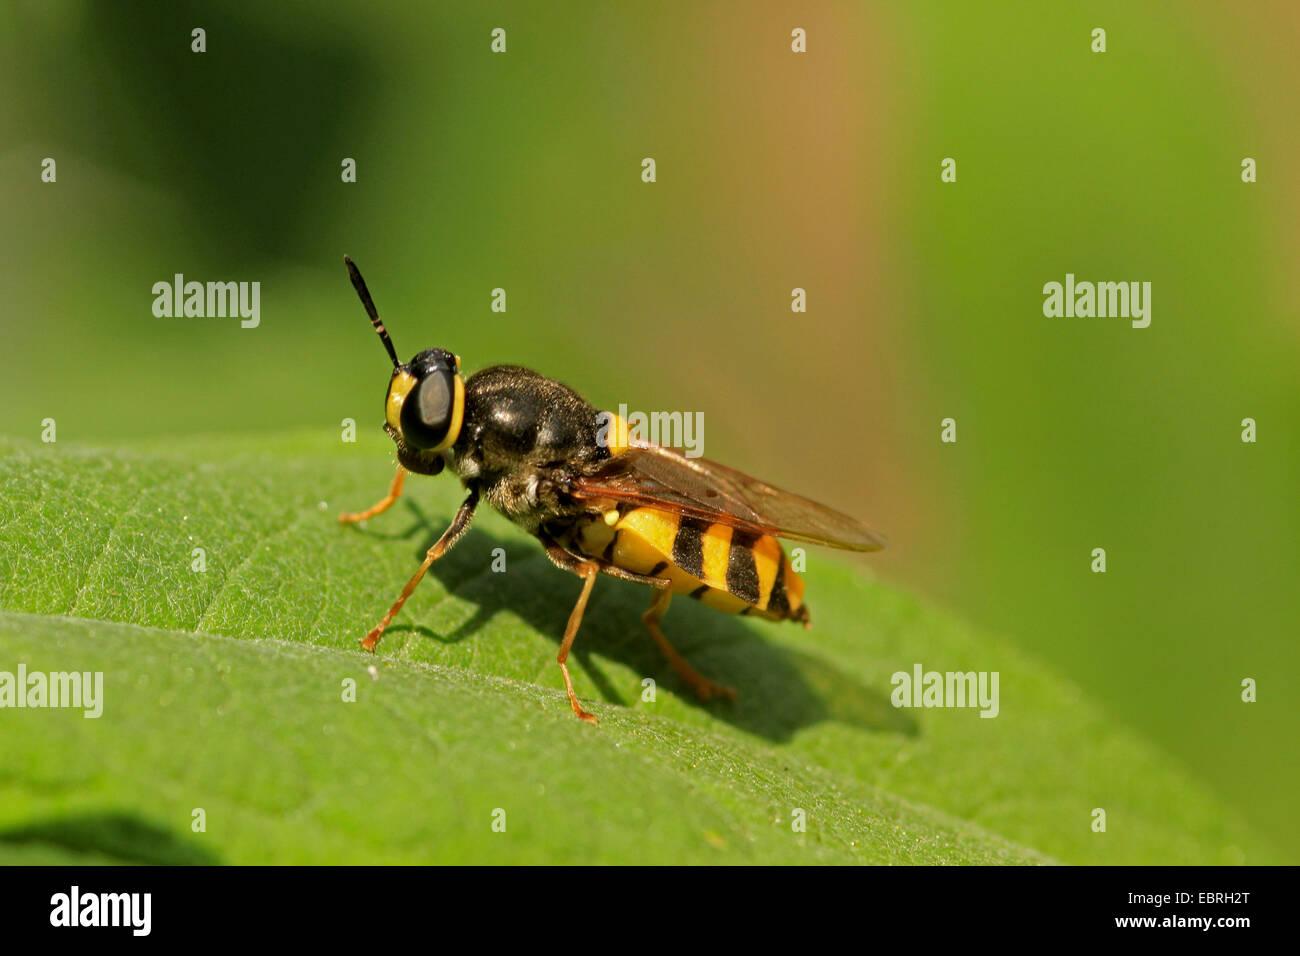 soldier flies (Stratiomyidae), on a leaf - Stock Image